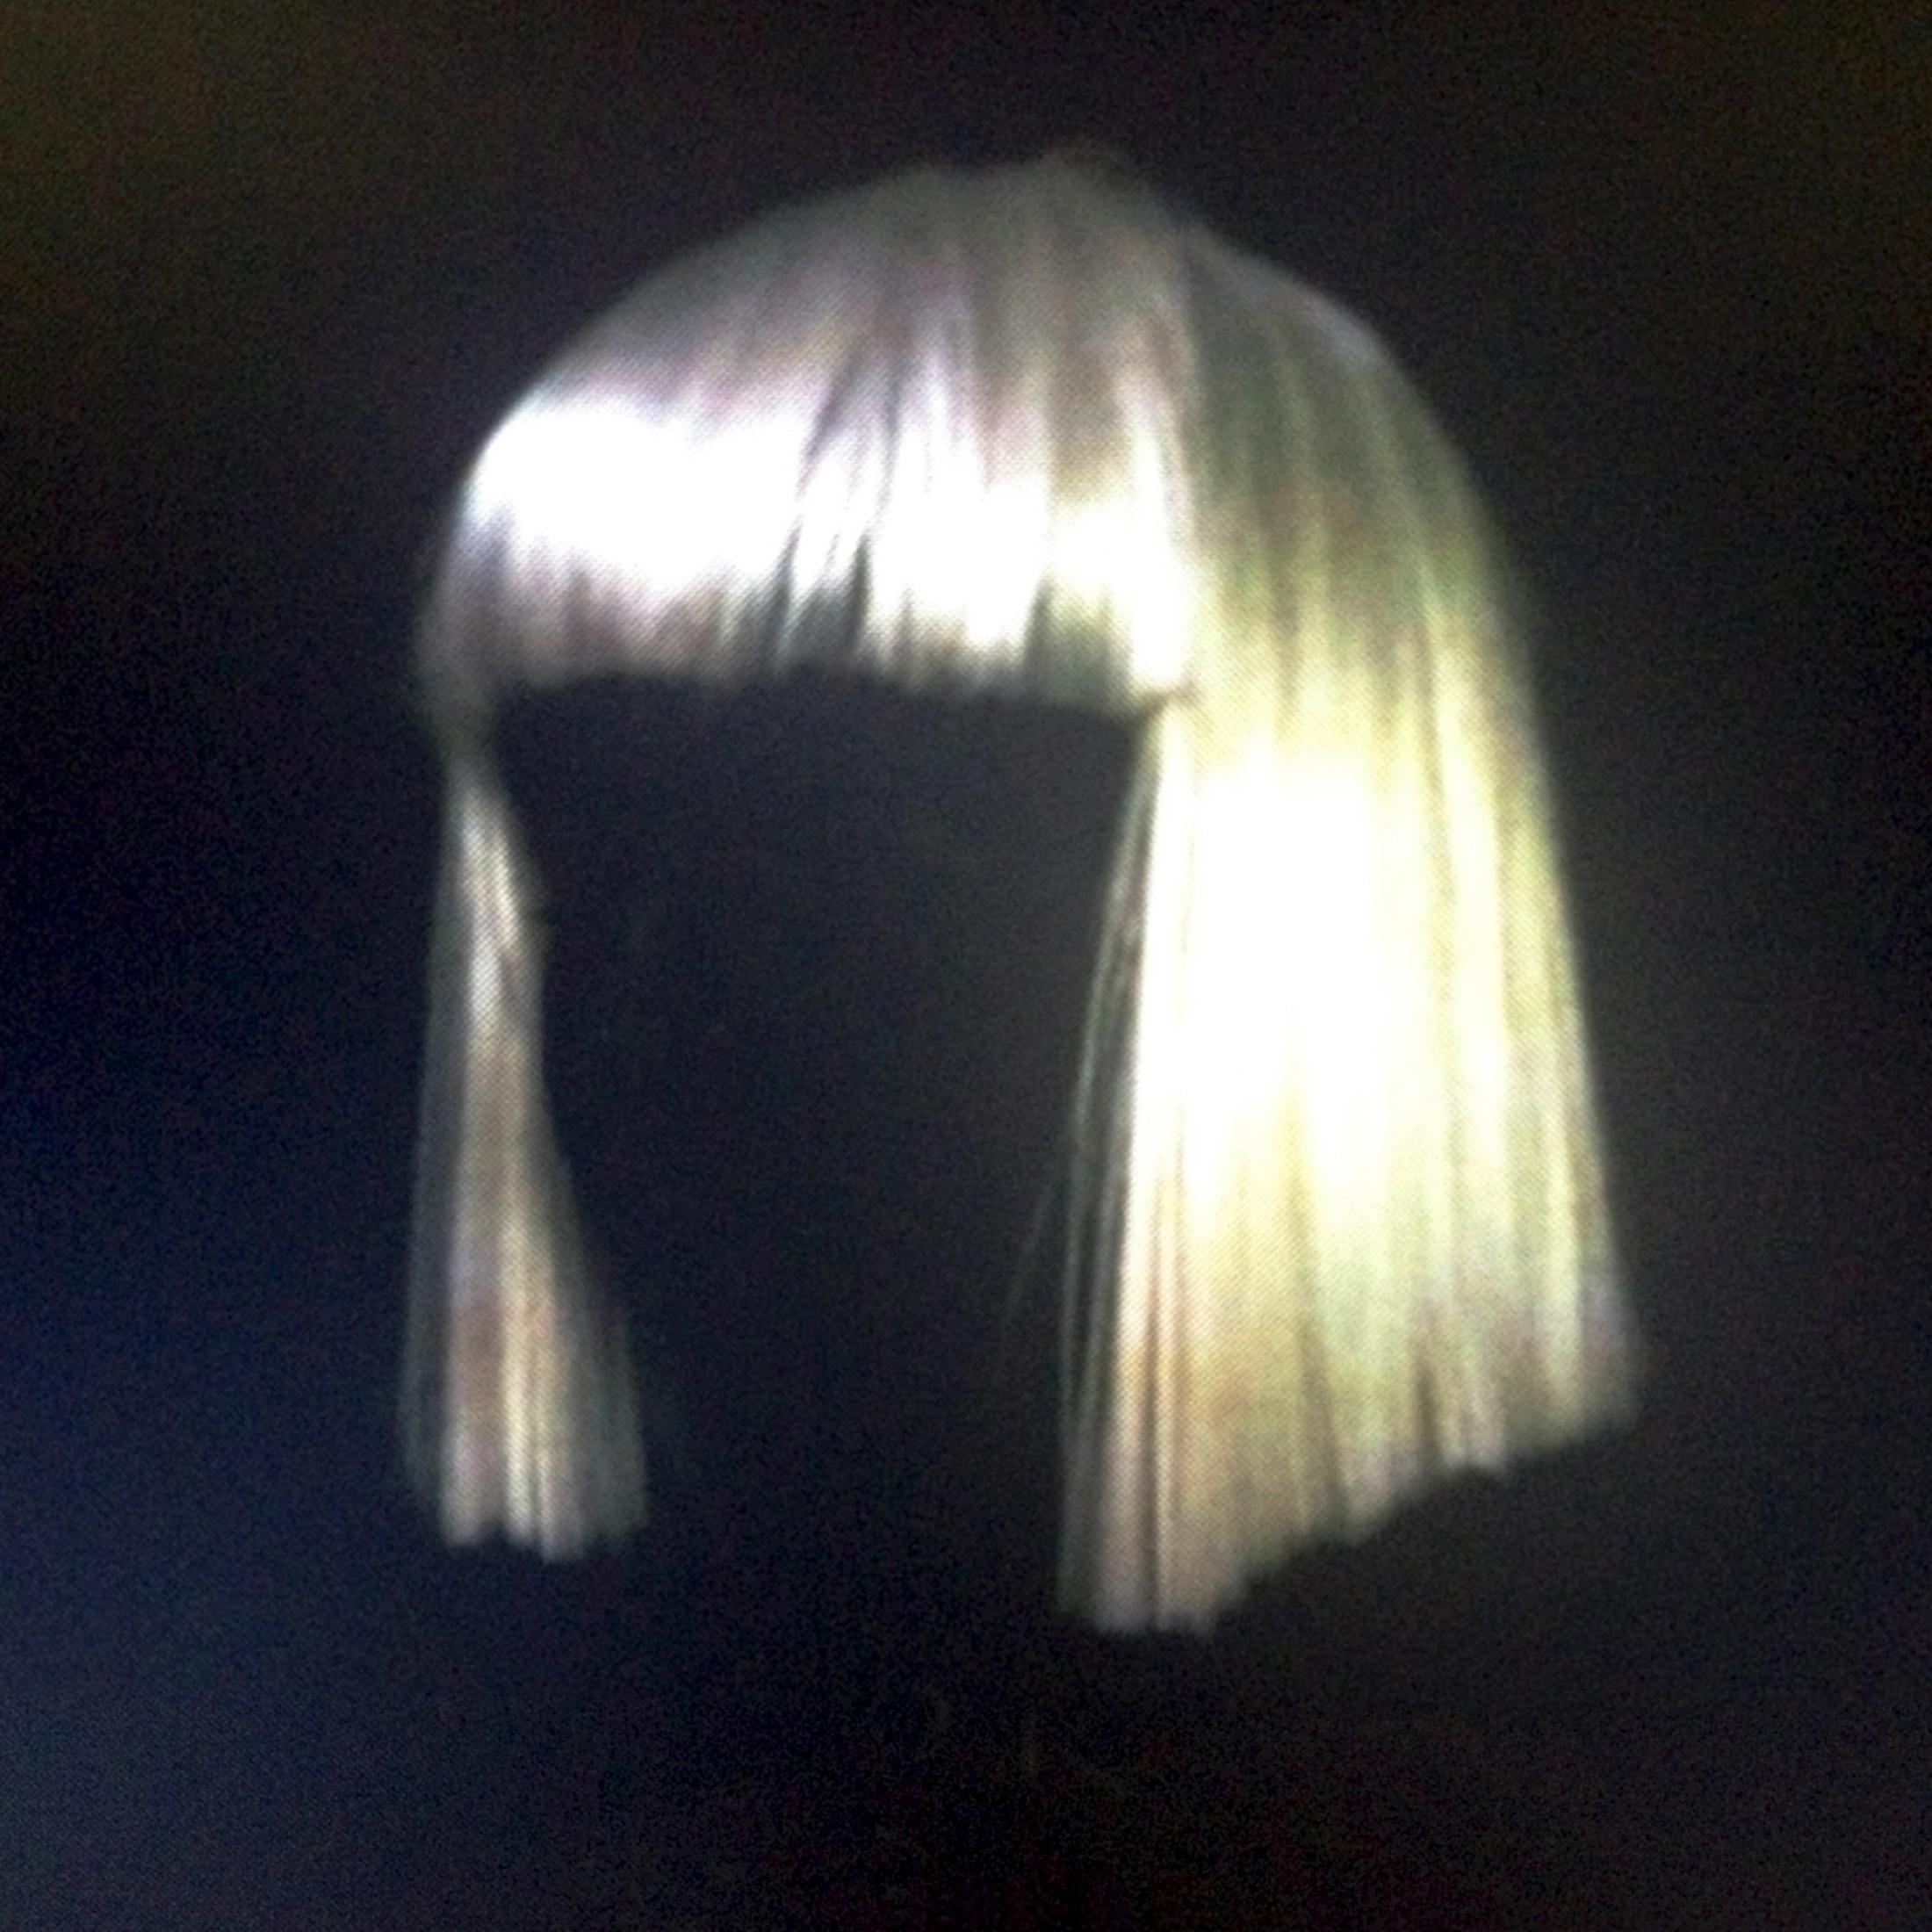 Sia chandelier music video clios image media for chandelier music video mozeypictures Images